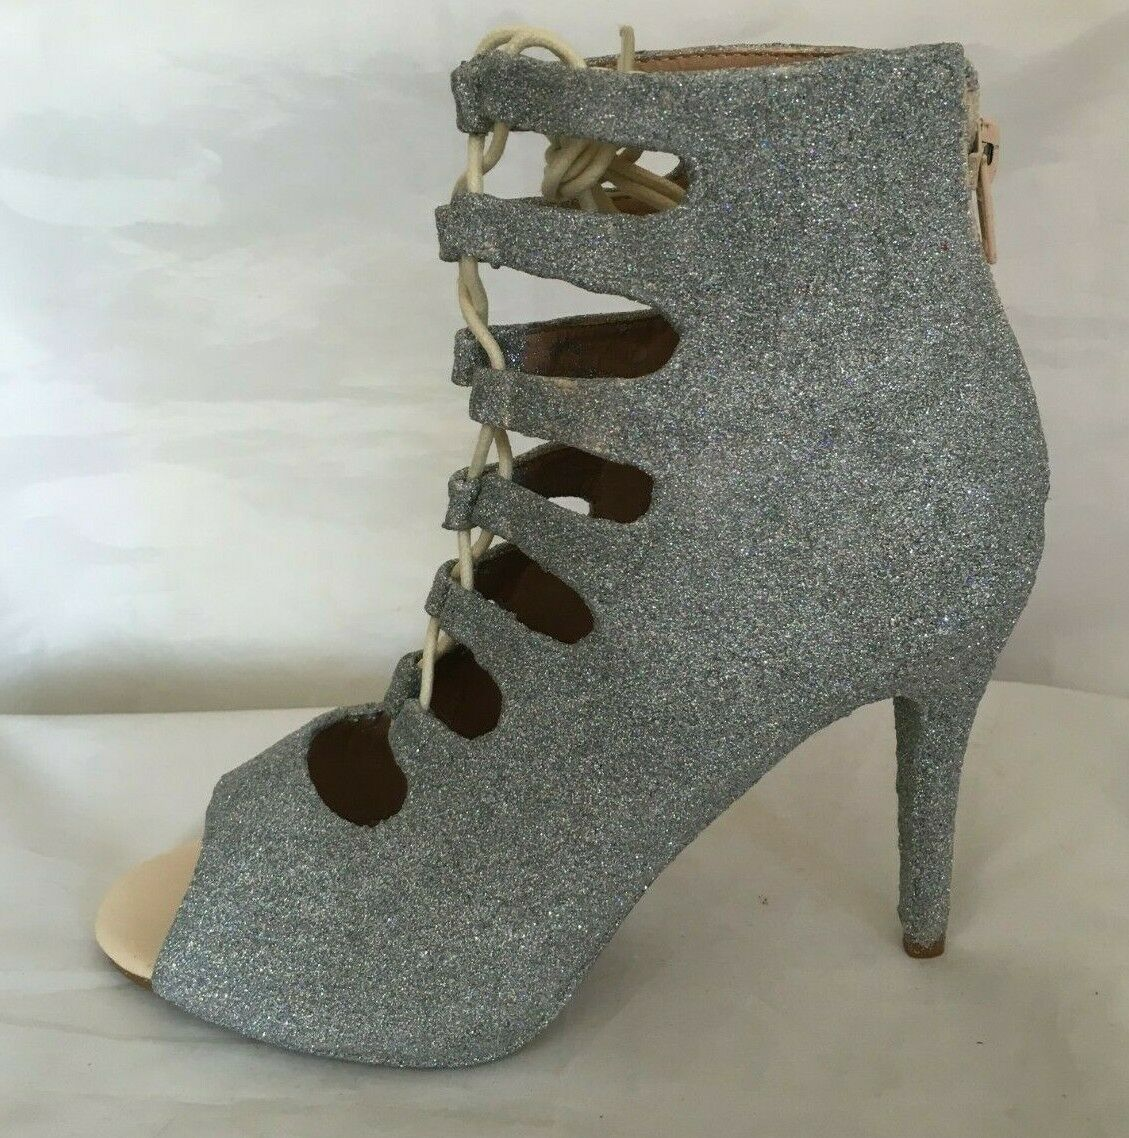 * NEUF * Chaussures femmes/Sandales Taille UK 6/39 Holographique Glitter/ARGENT/Scintillant Talons